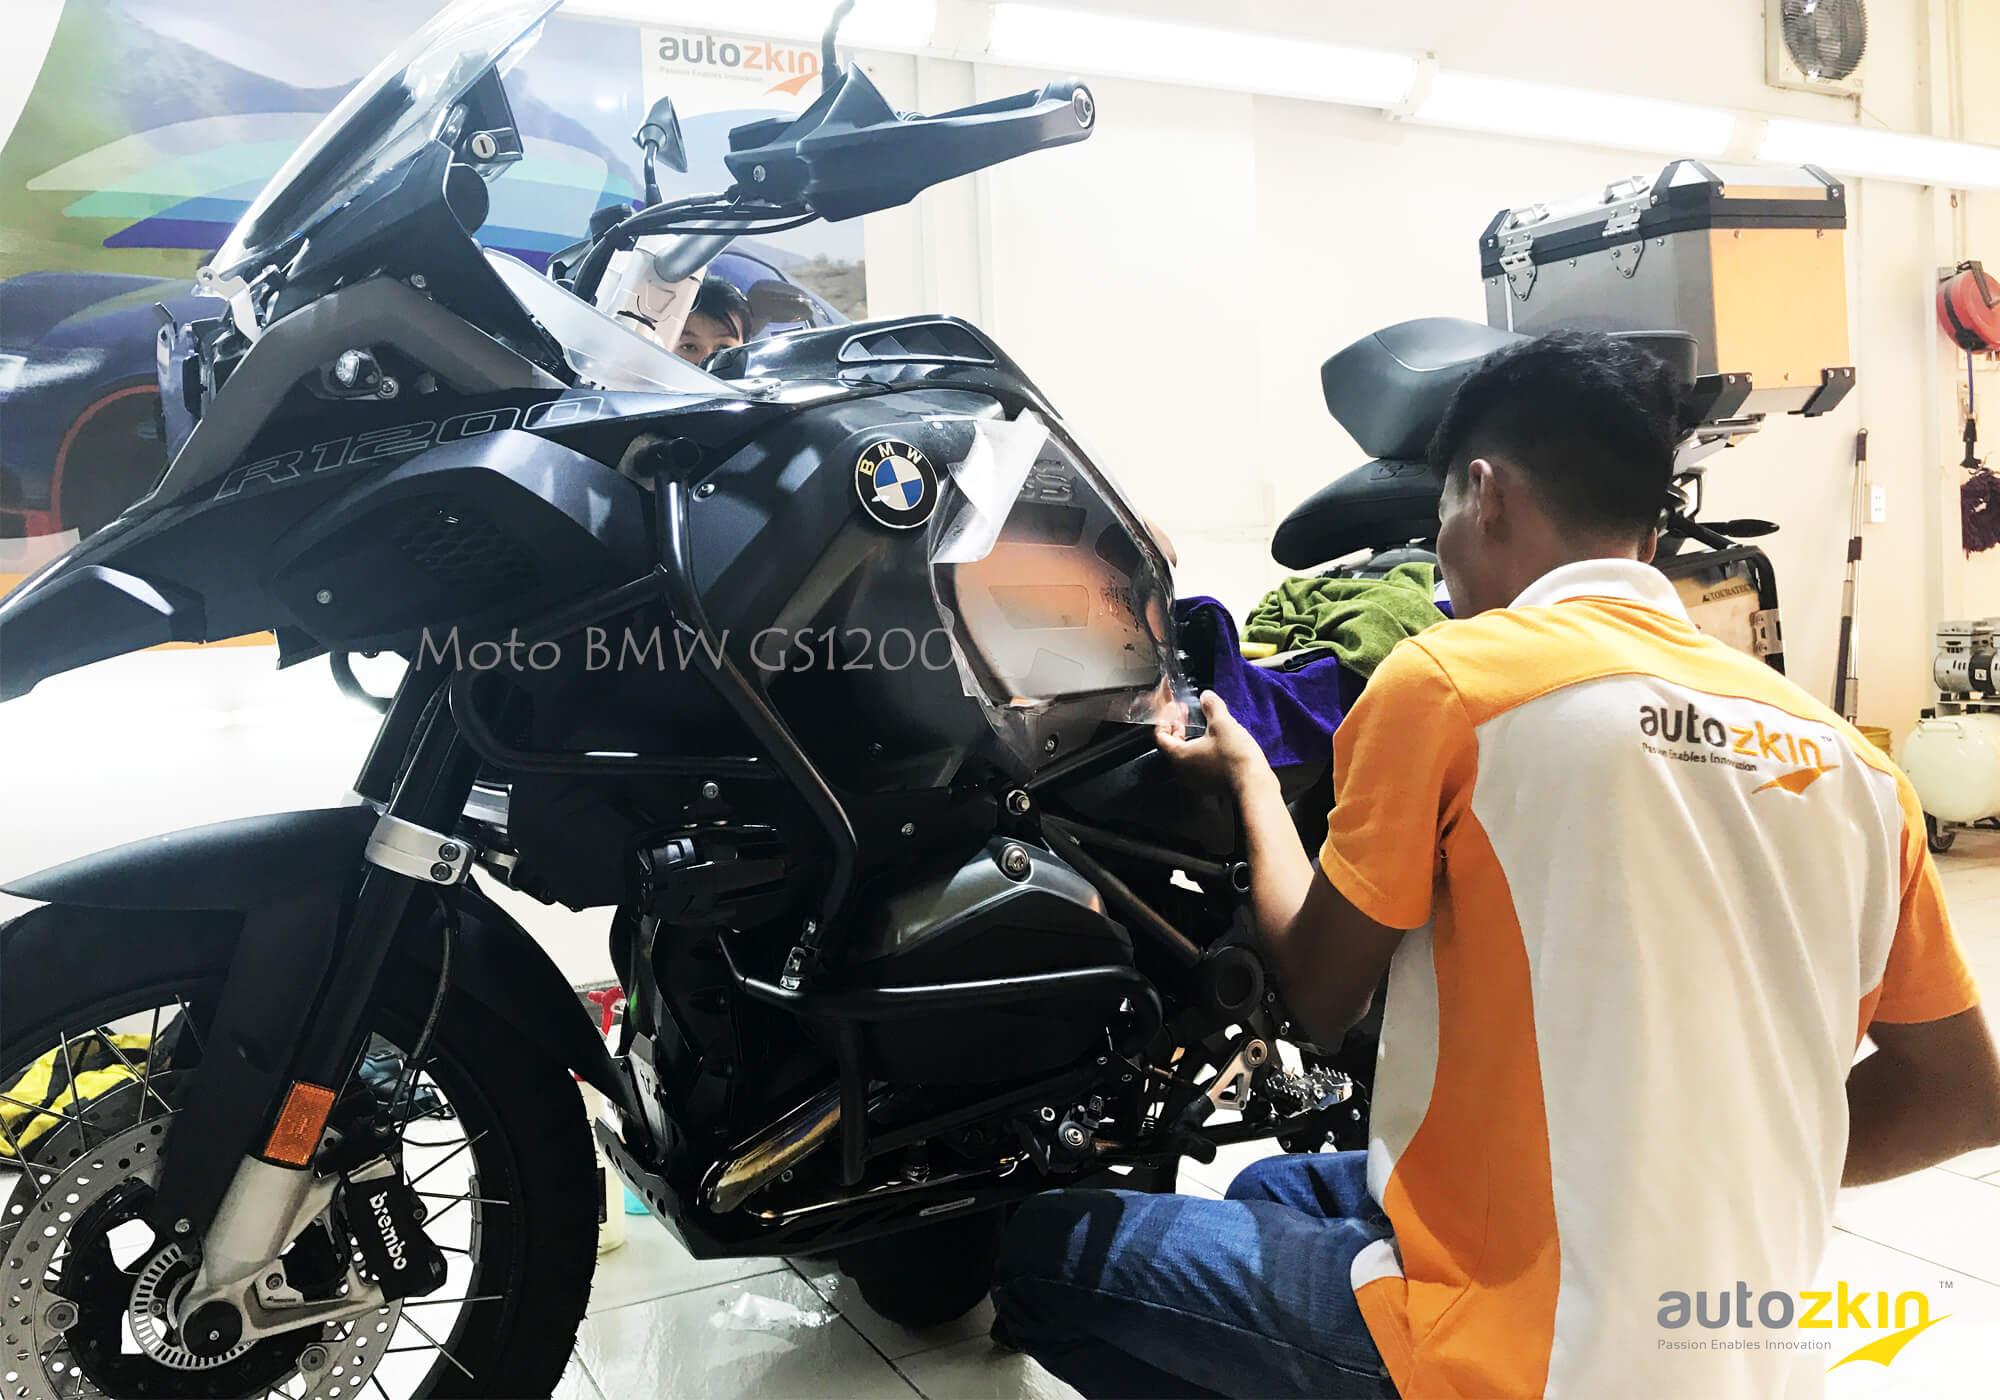 Moto BMW GS1200